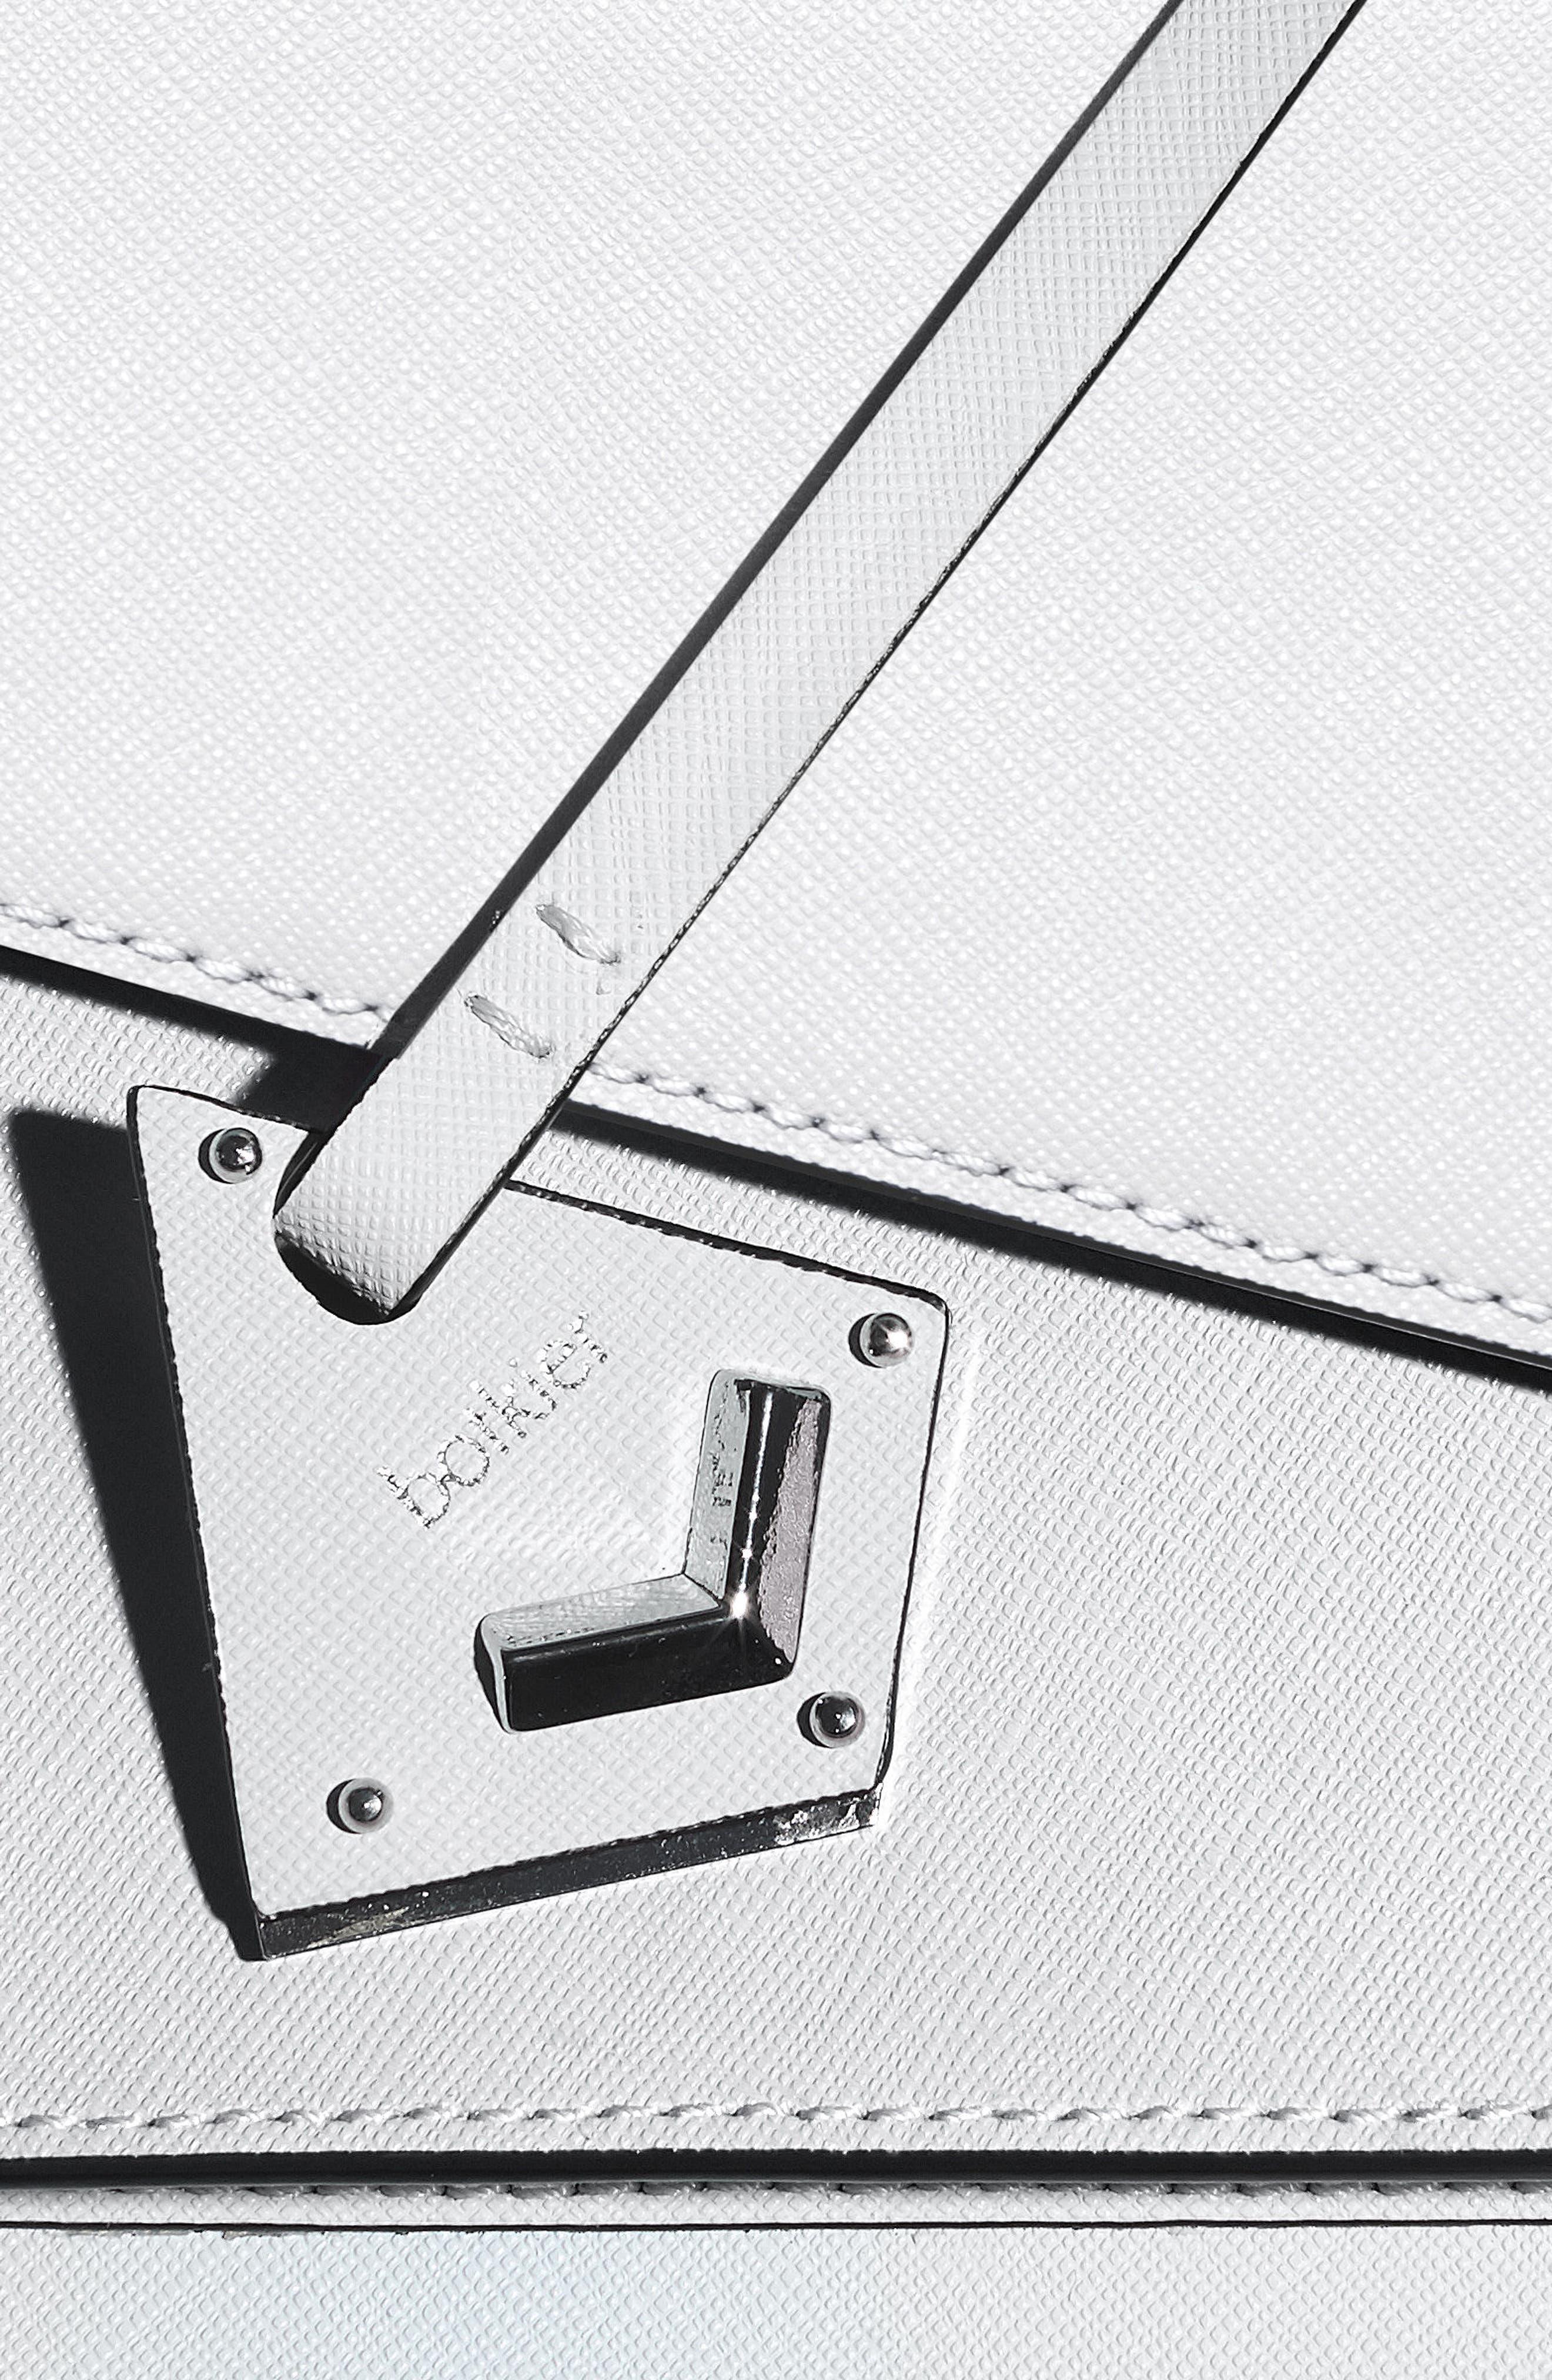 Cobble Hill Leather Crossbody Bag,                             Alternate thumbnail 101, color,